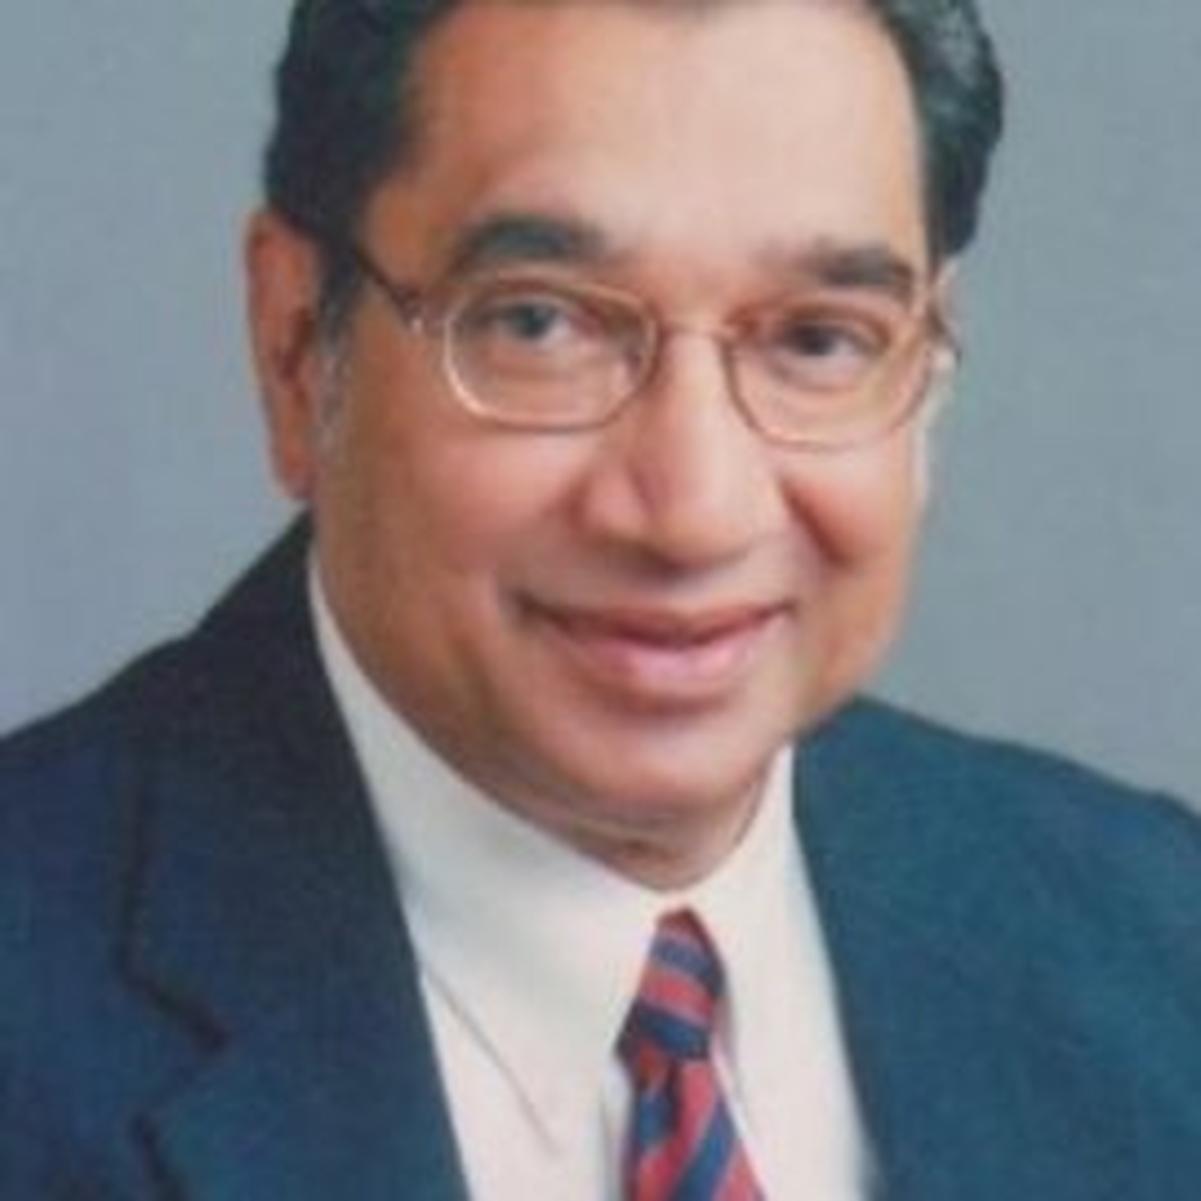 Walter Vieira